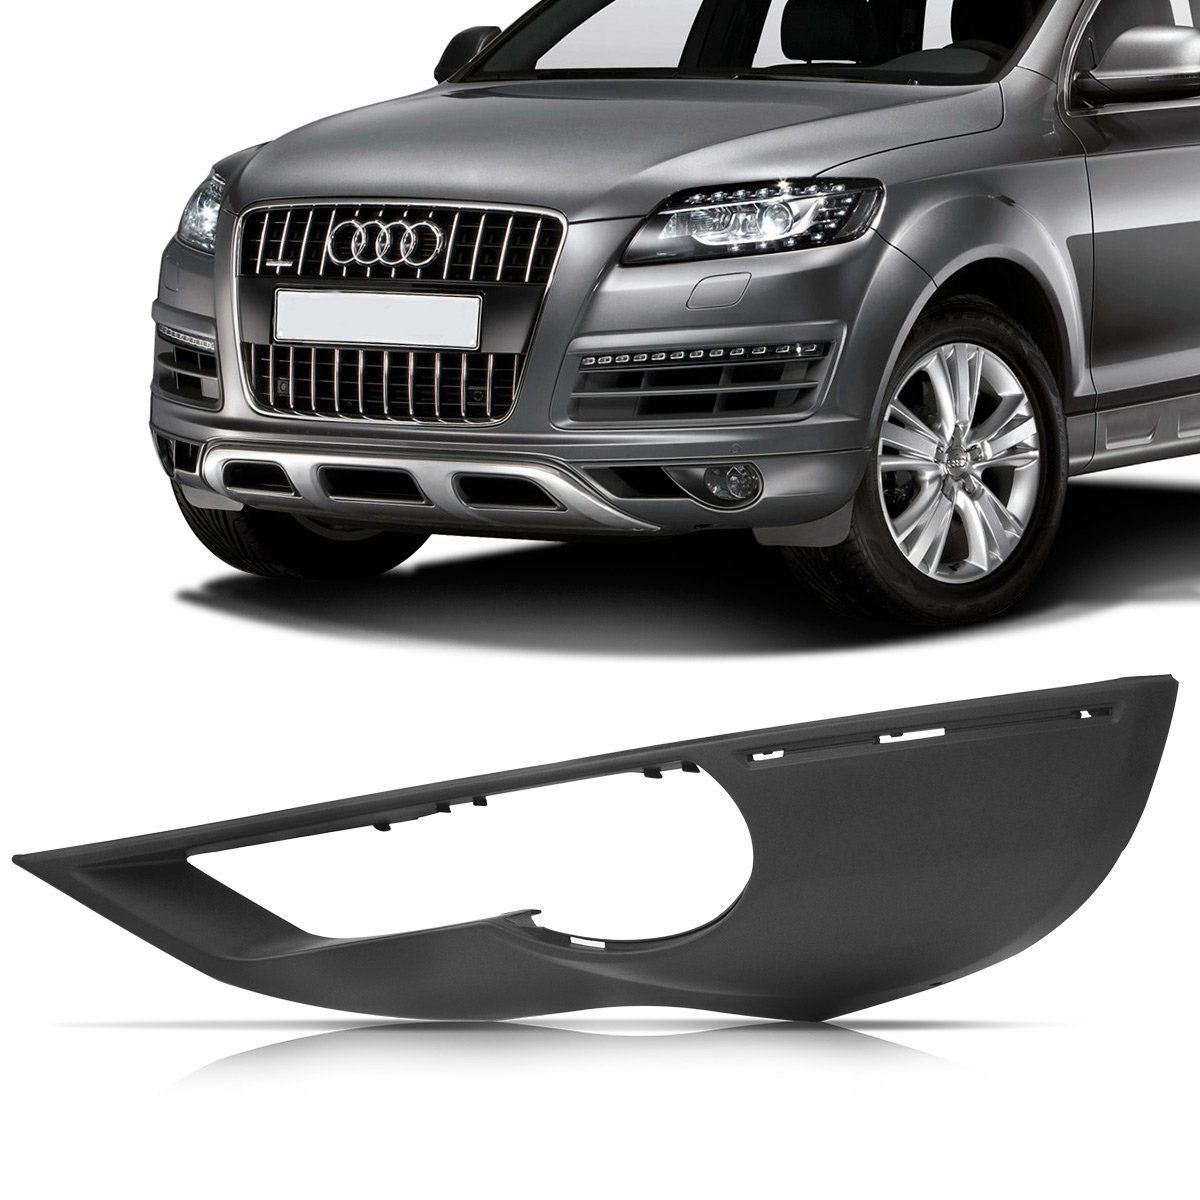 Spoiler Dianteiro Audi Q7 11/15 Le